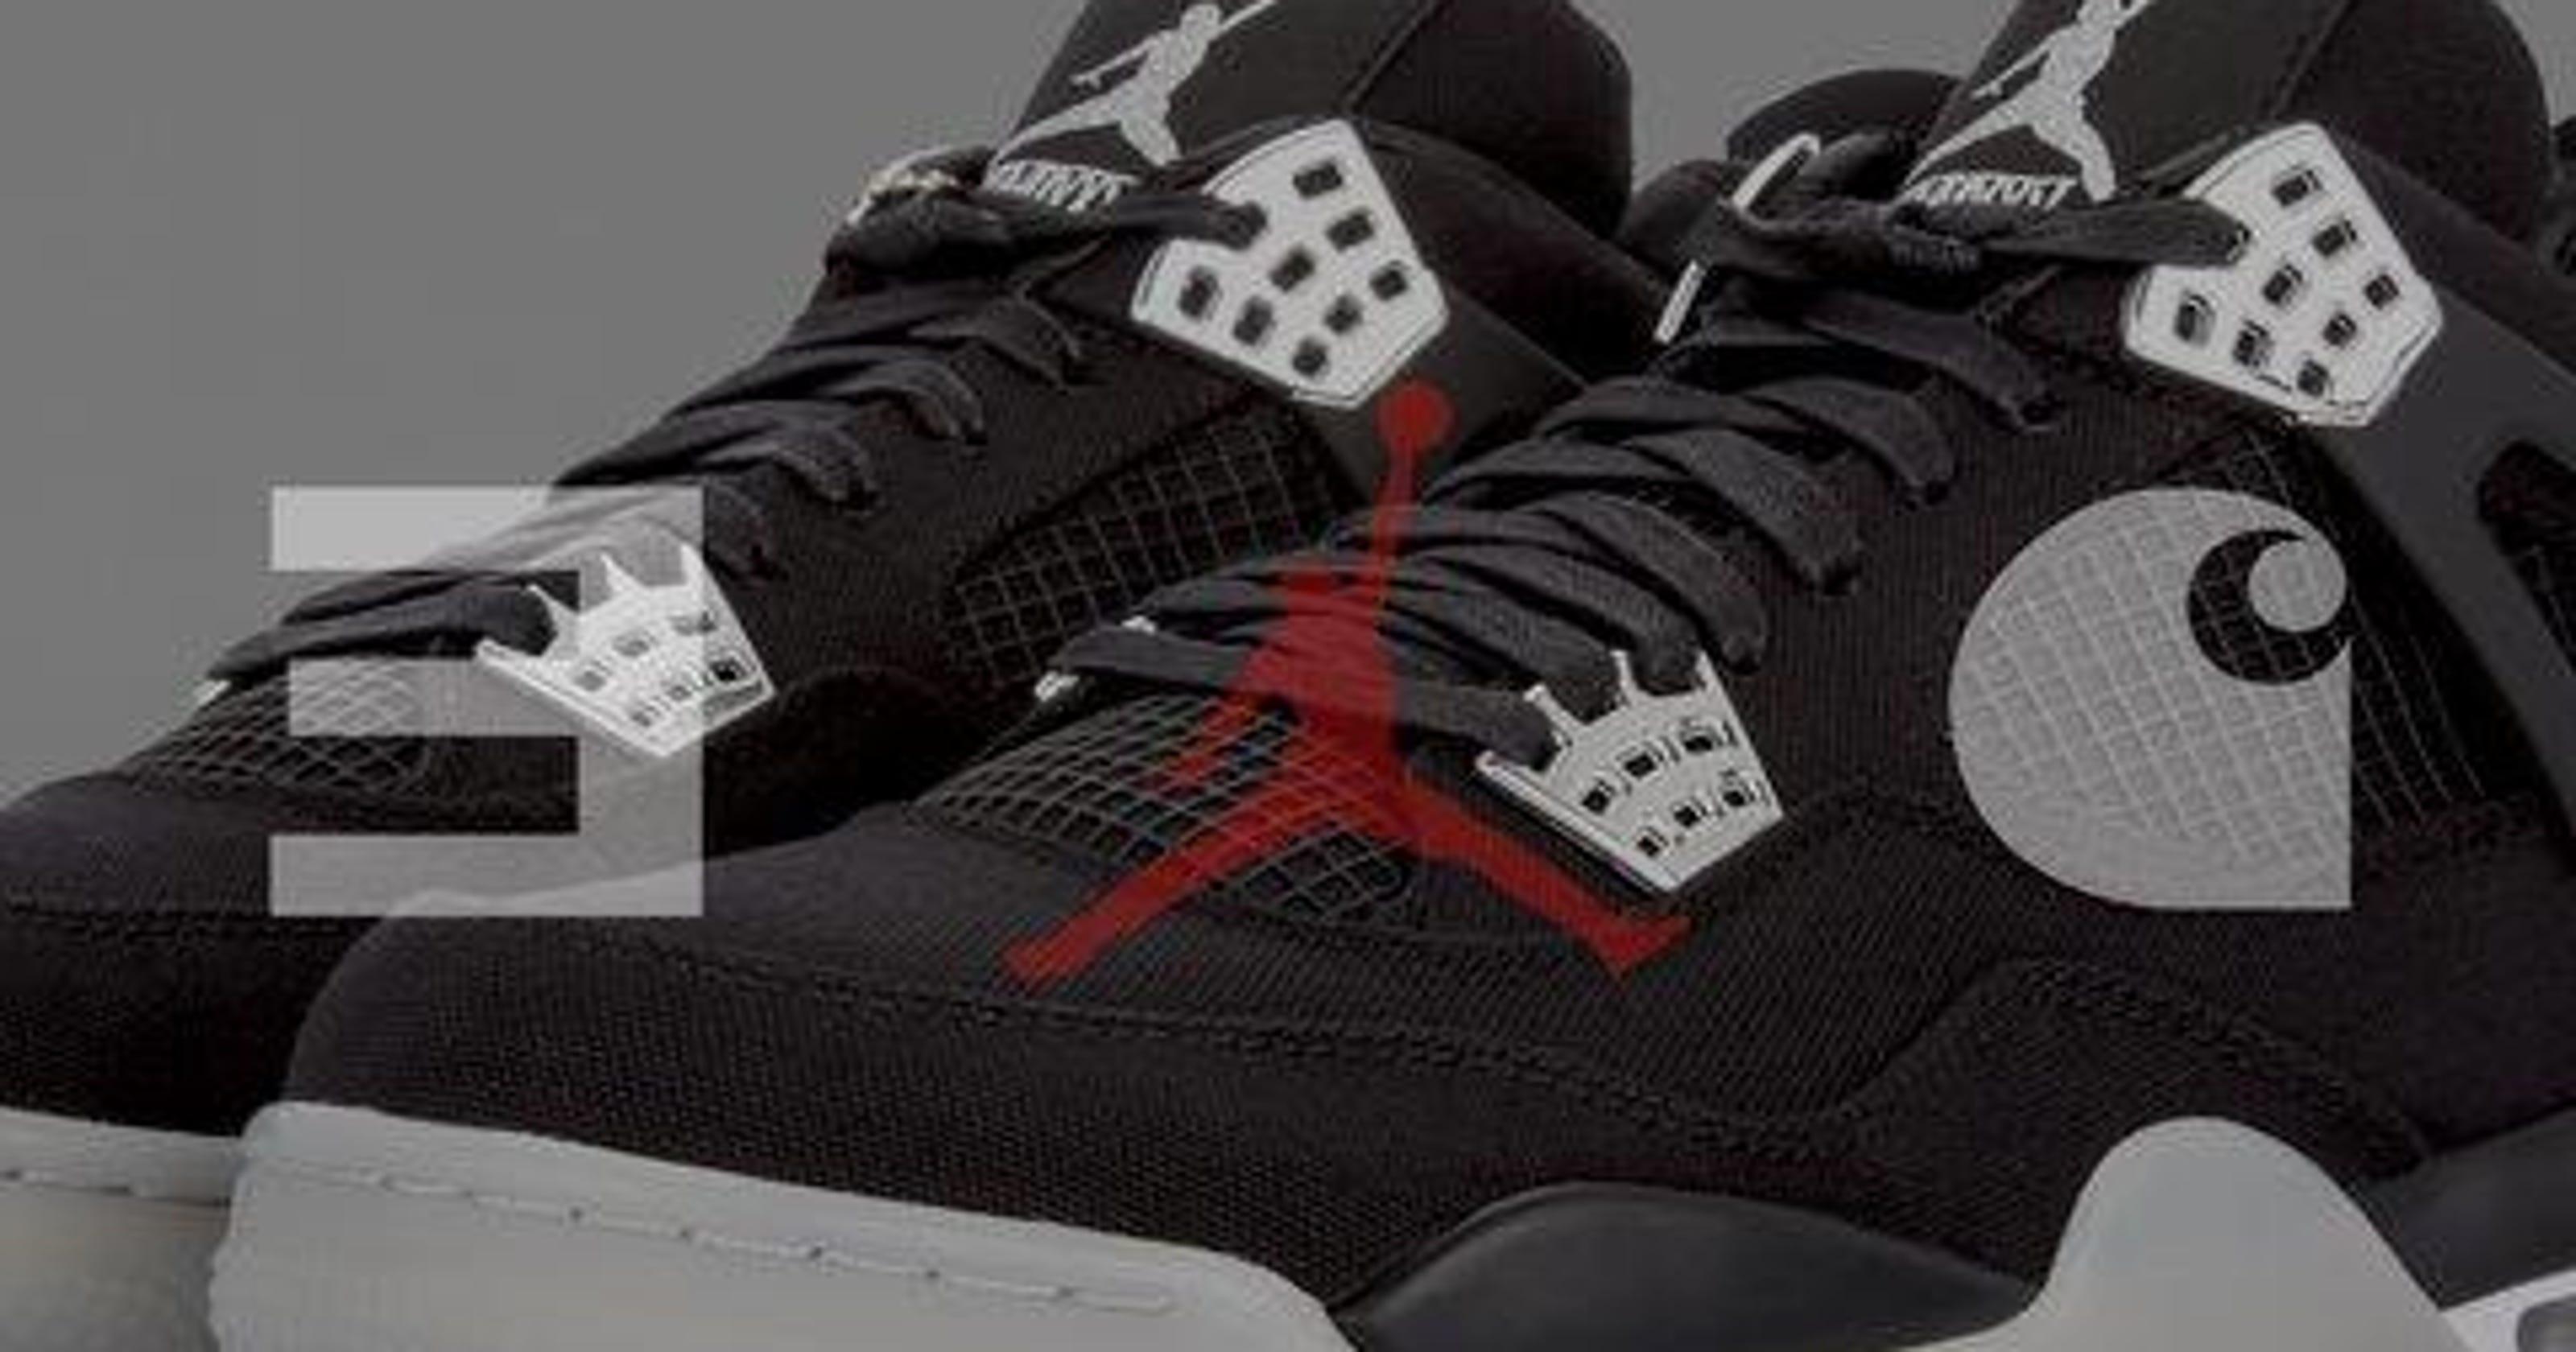 28ae01d28468 Eminem auctioning off exclusive Jordan sneakers on eBay